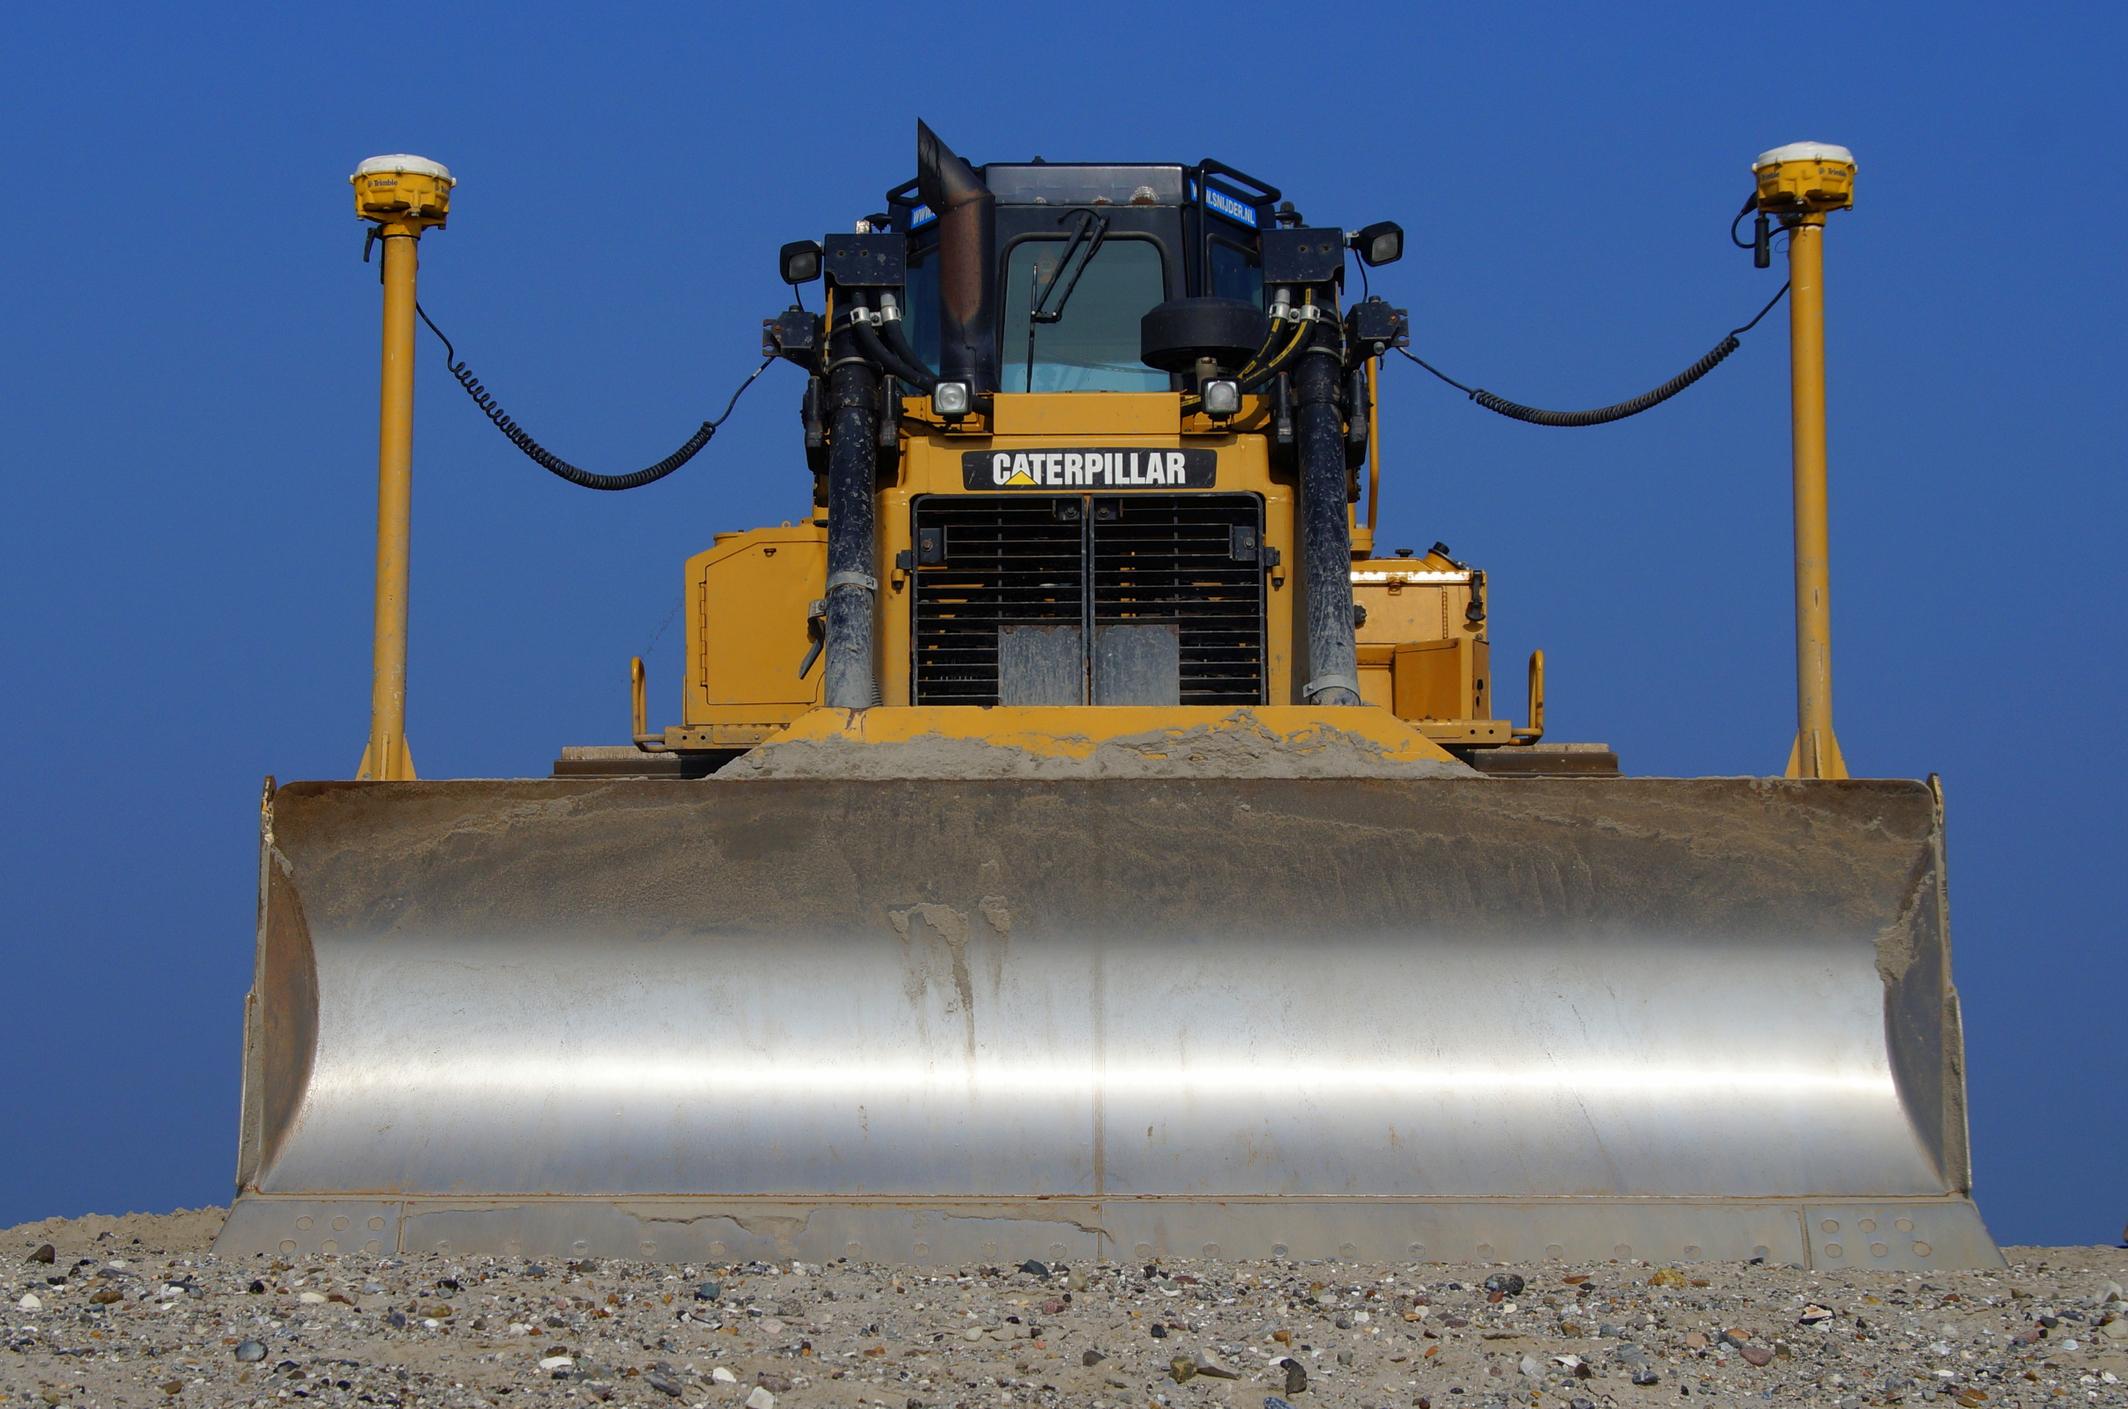 a front view of a Caterpillar bulldozer